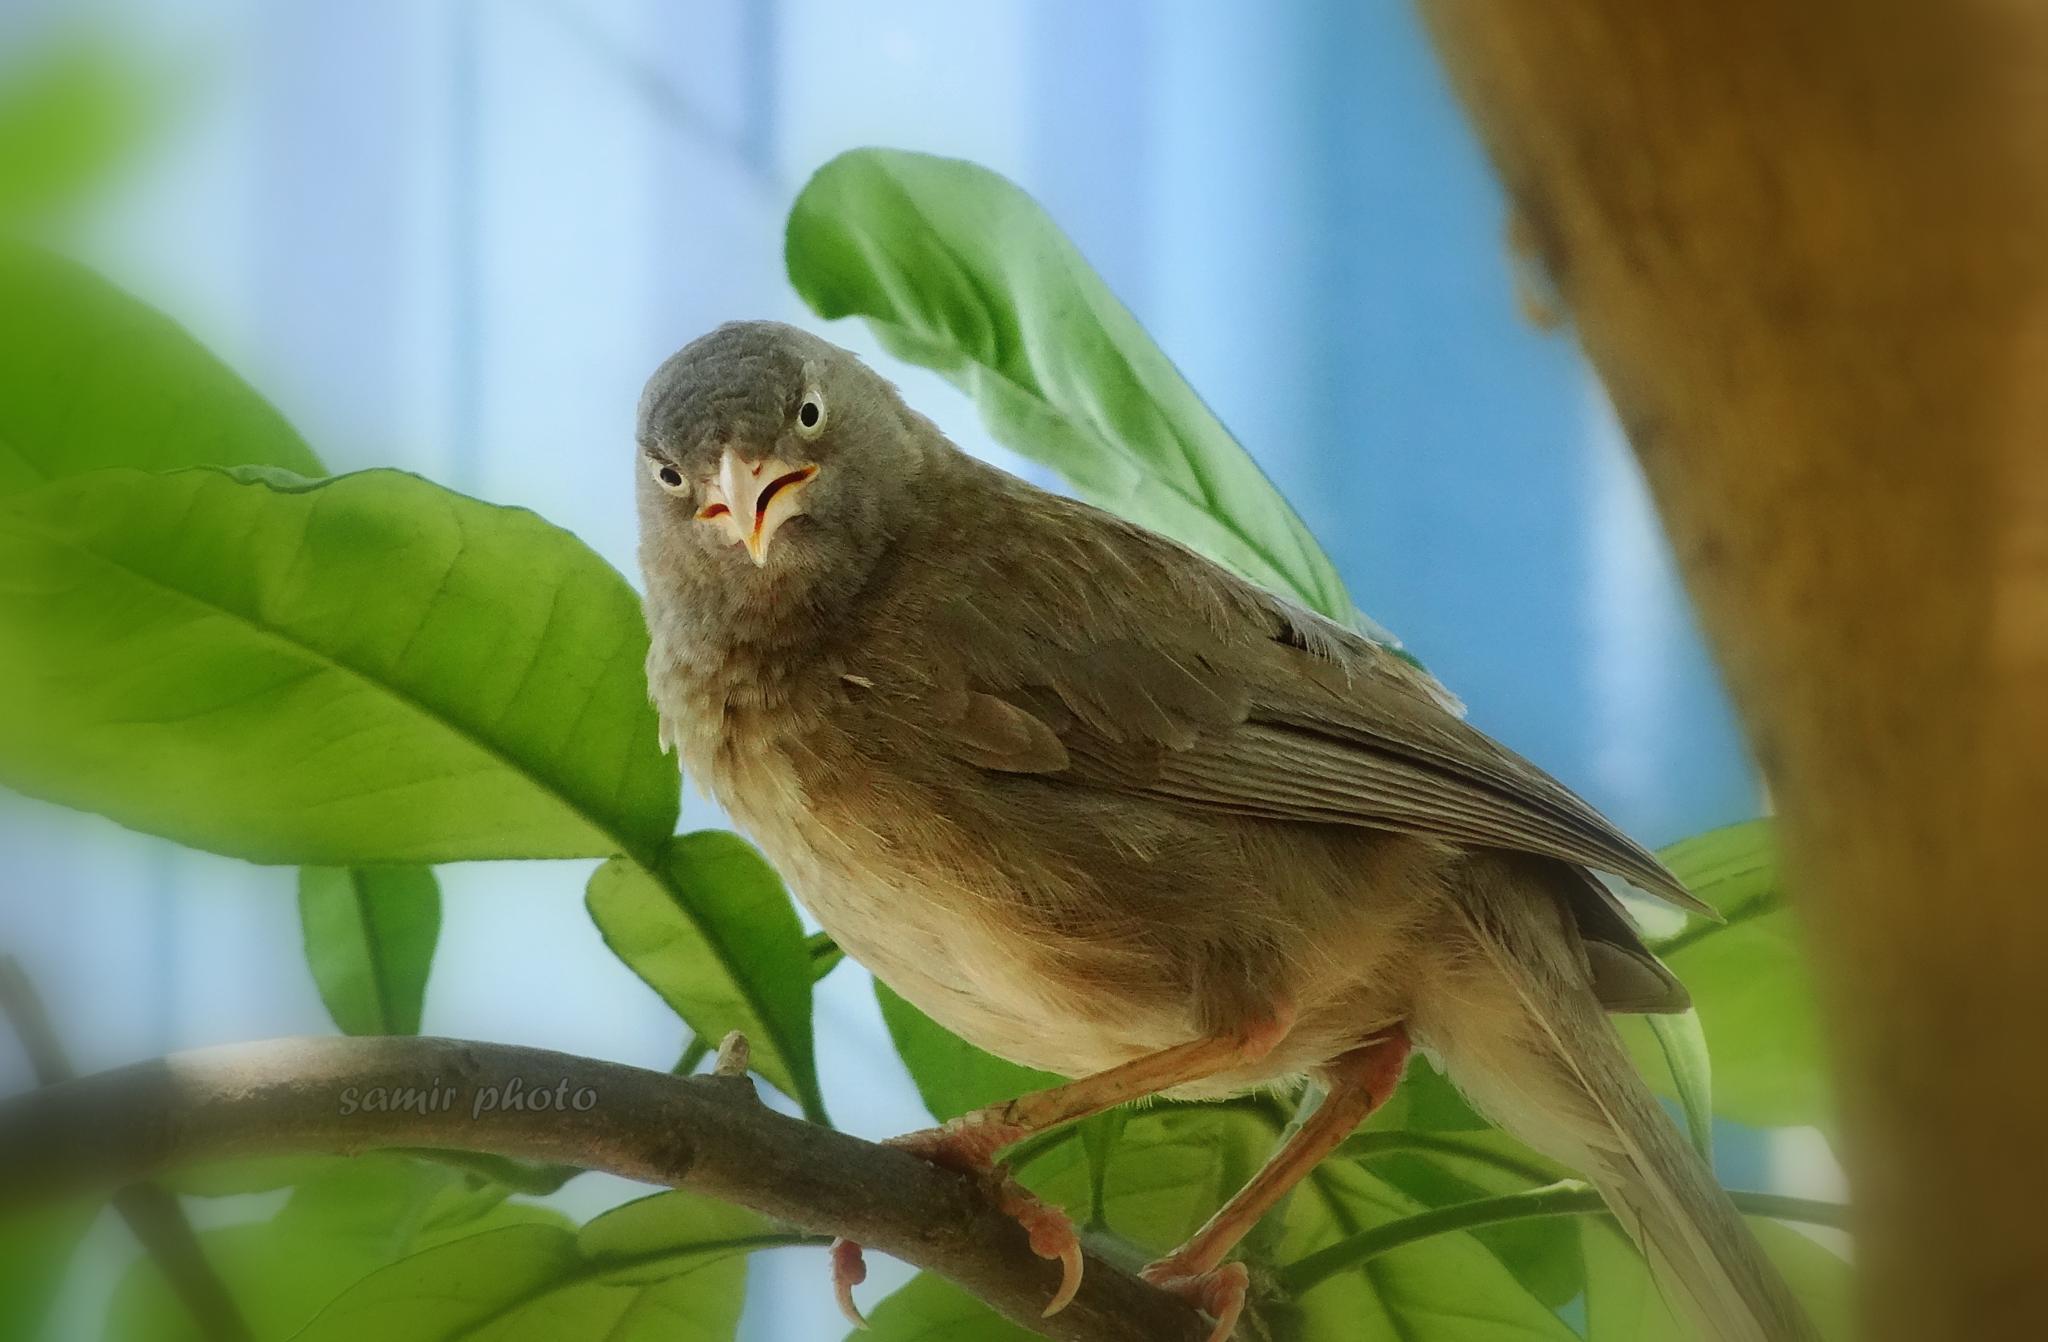 angry bird by samirsarkar